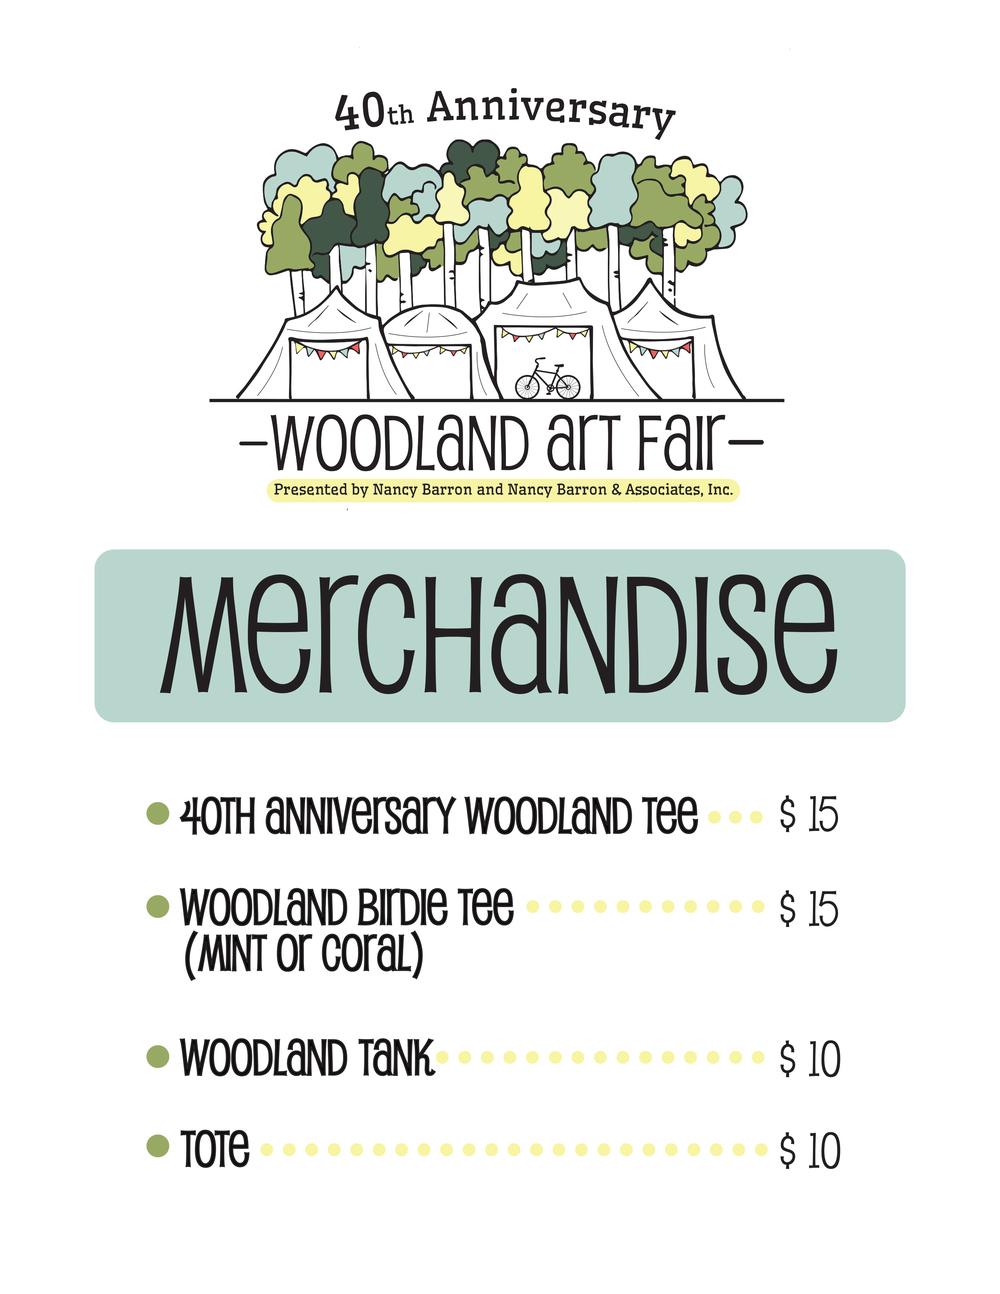 Woodland Merchandise